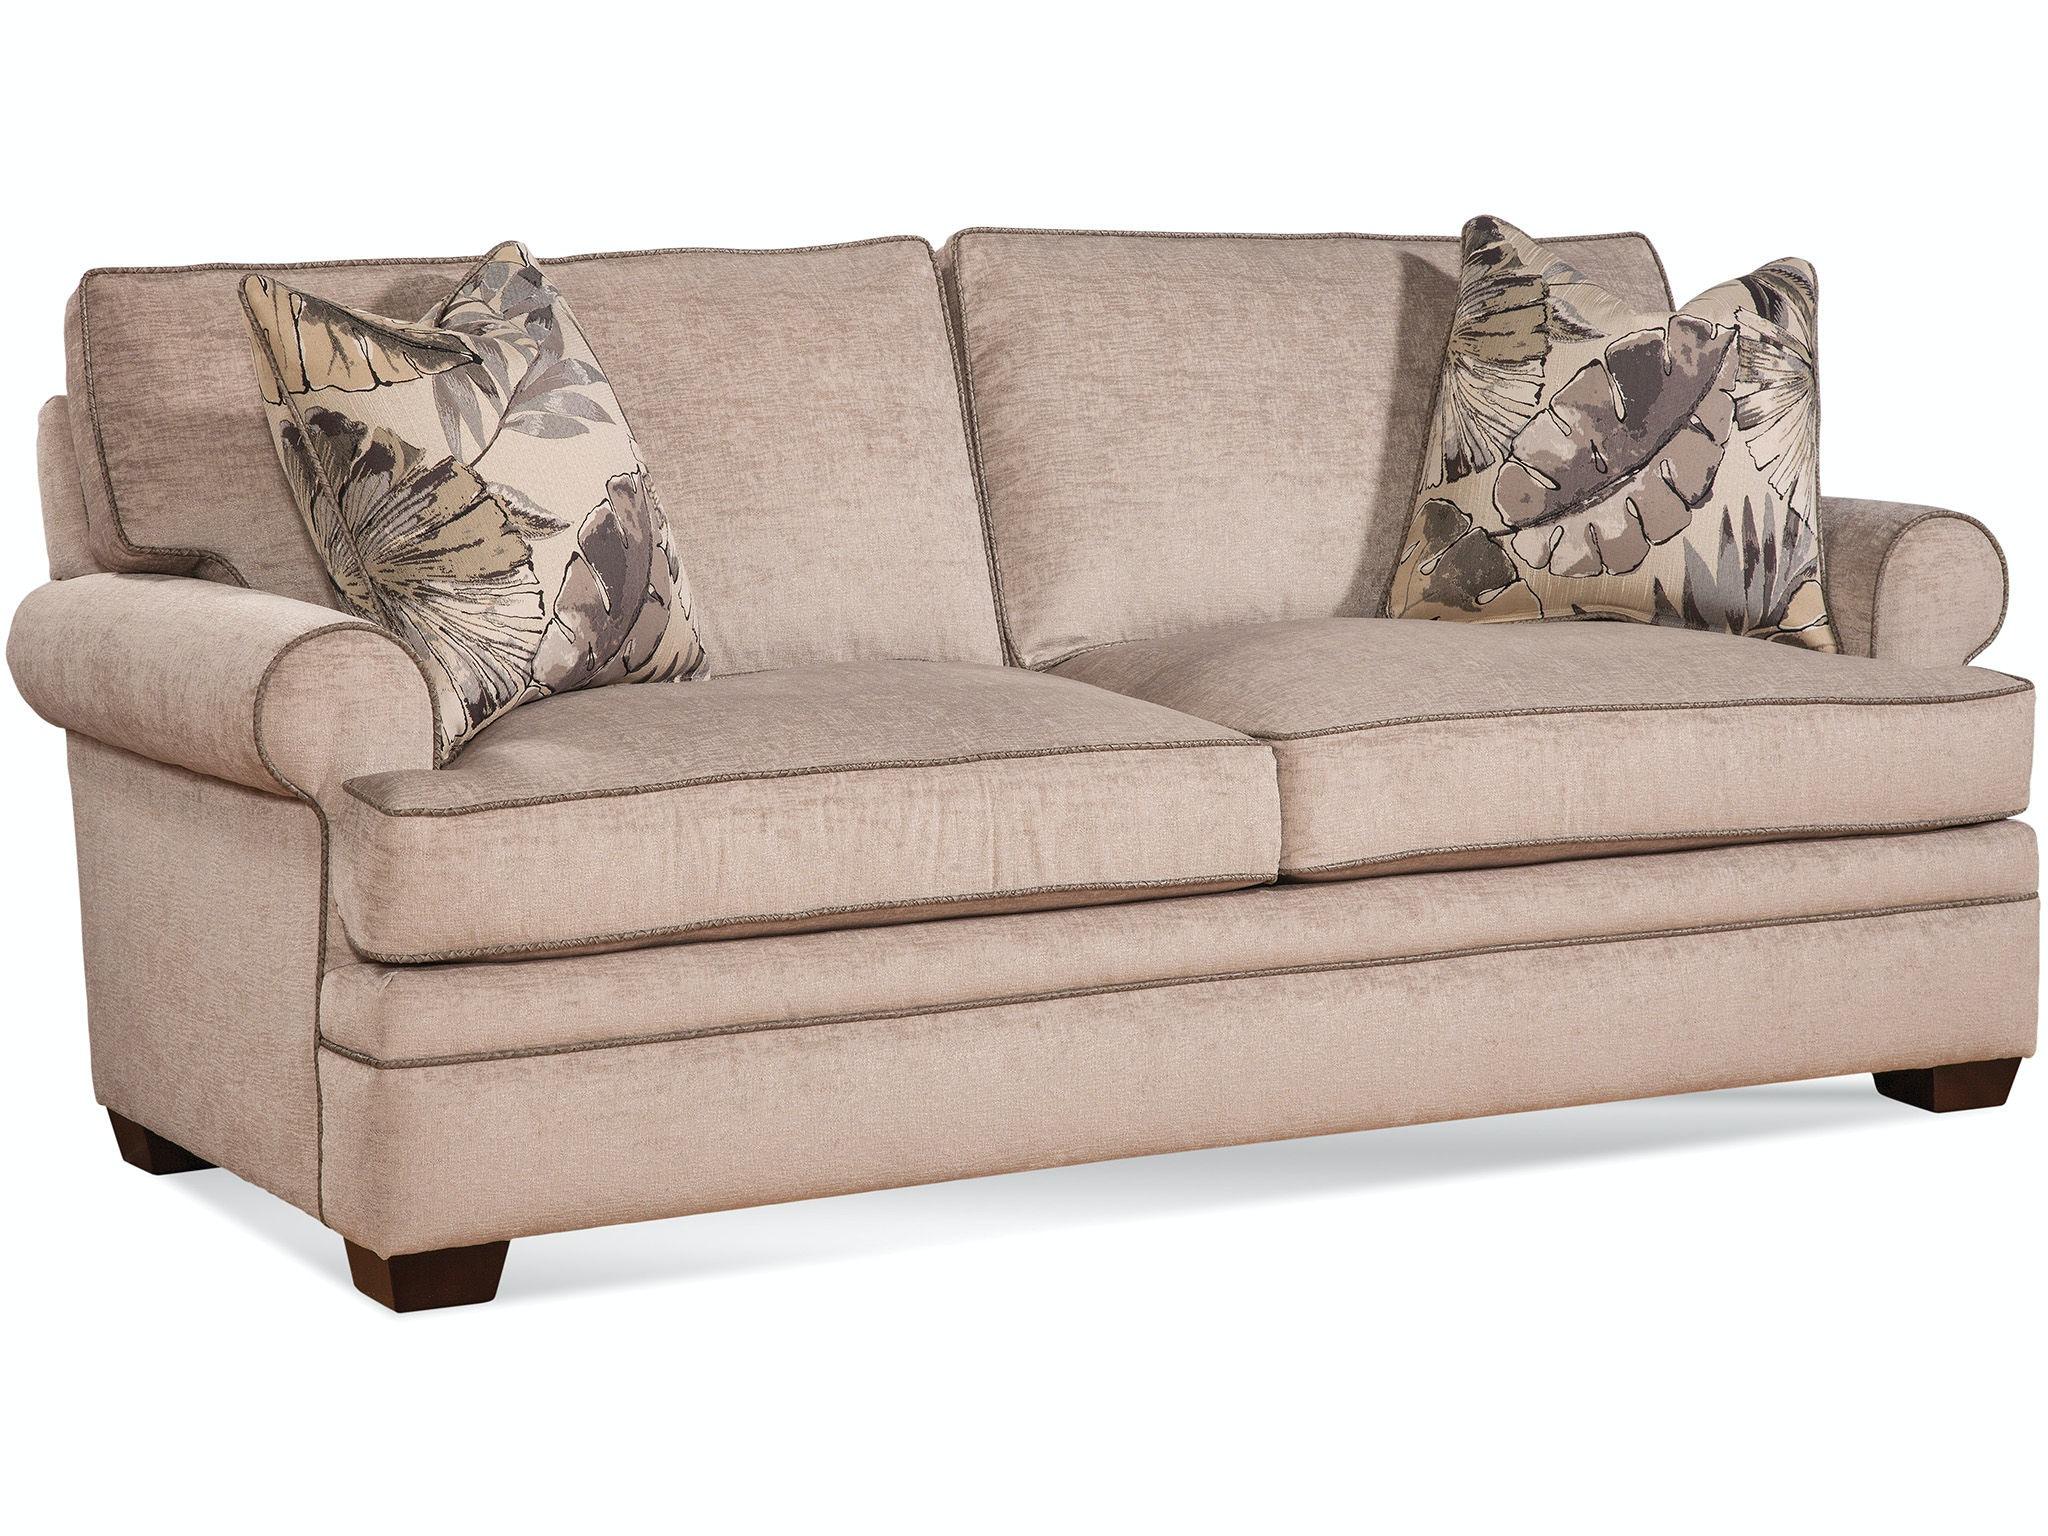 Braxton Culler Two Cushion Sofa 6212 0112